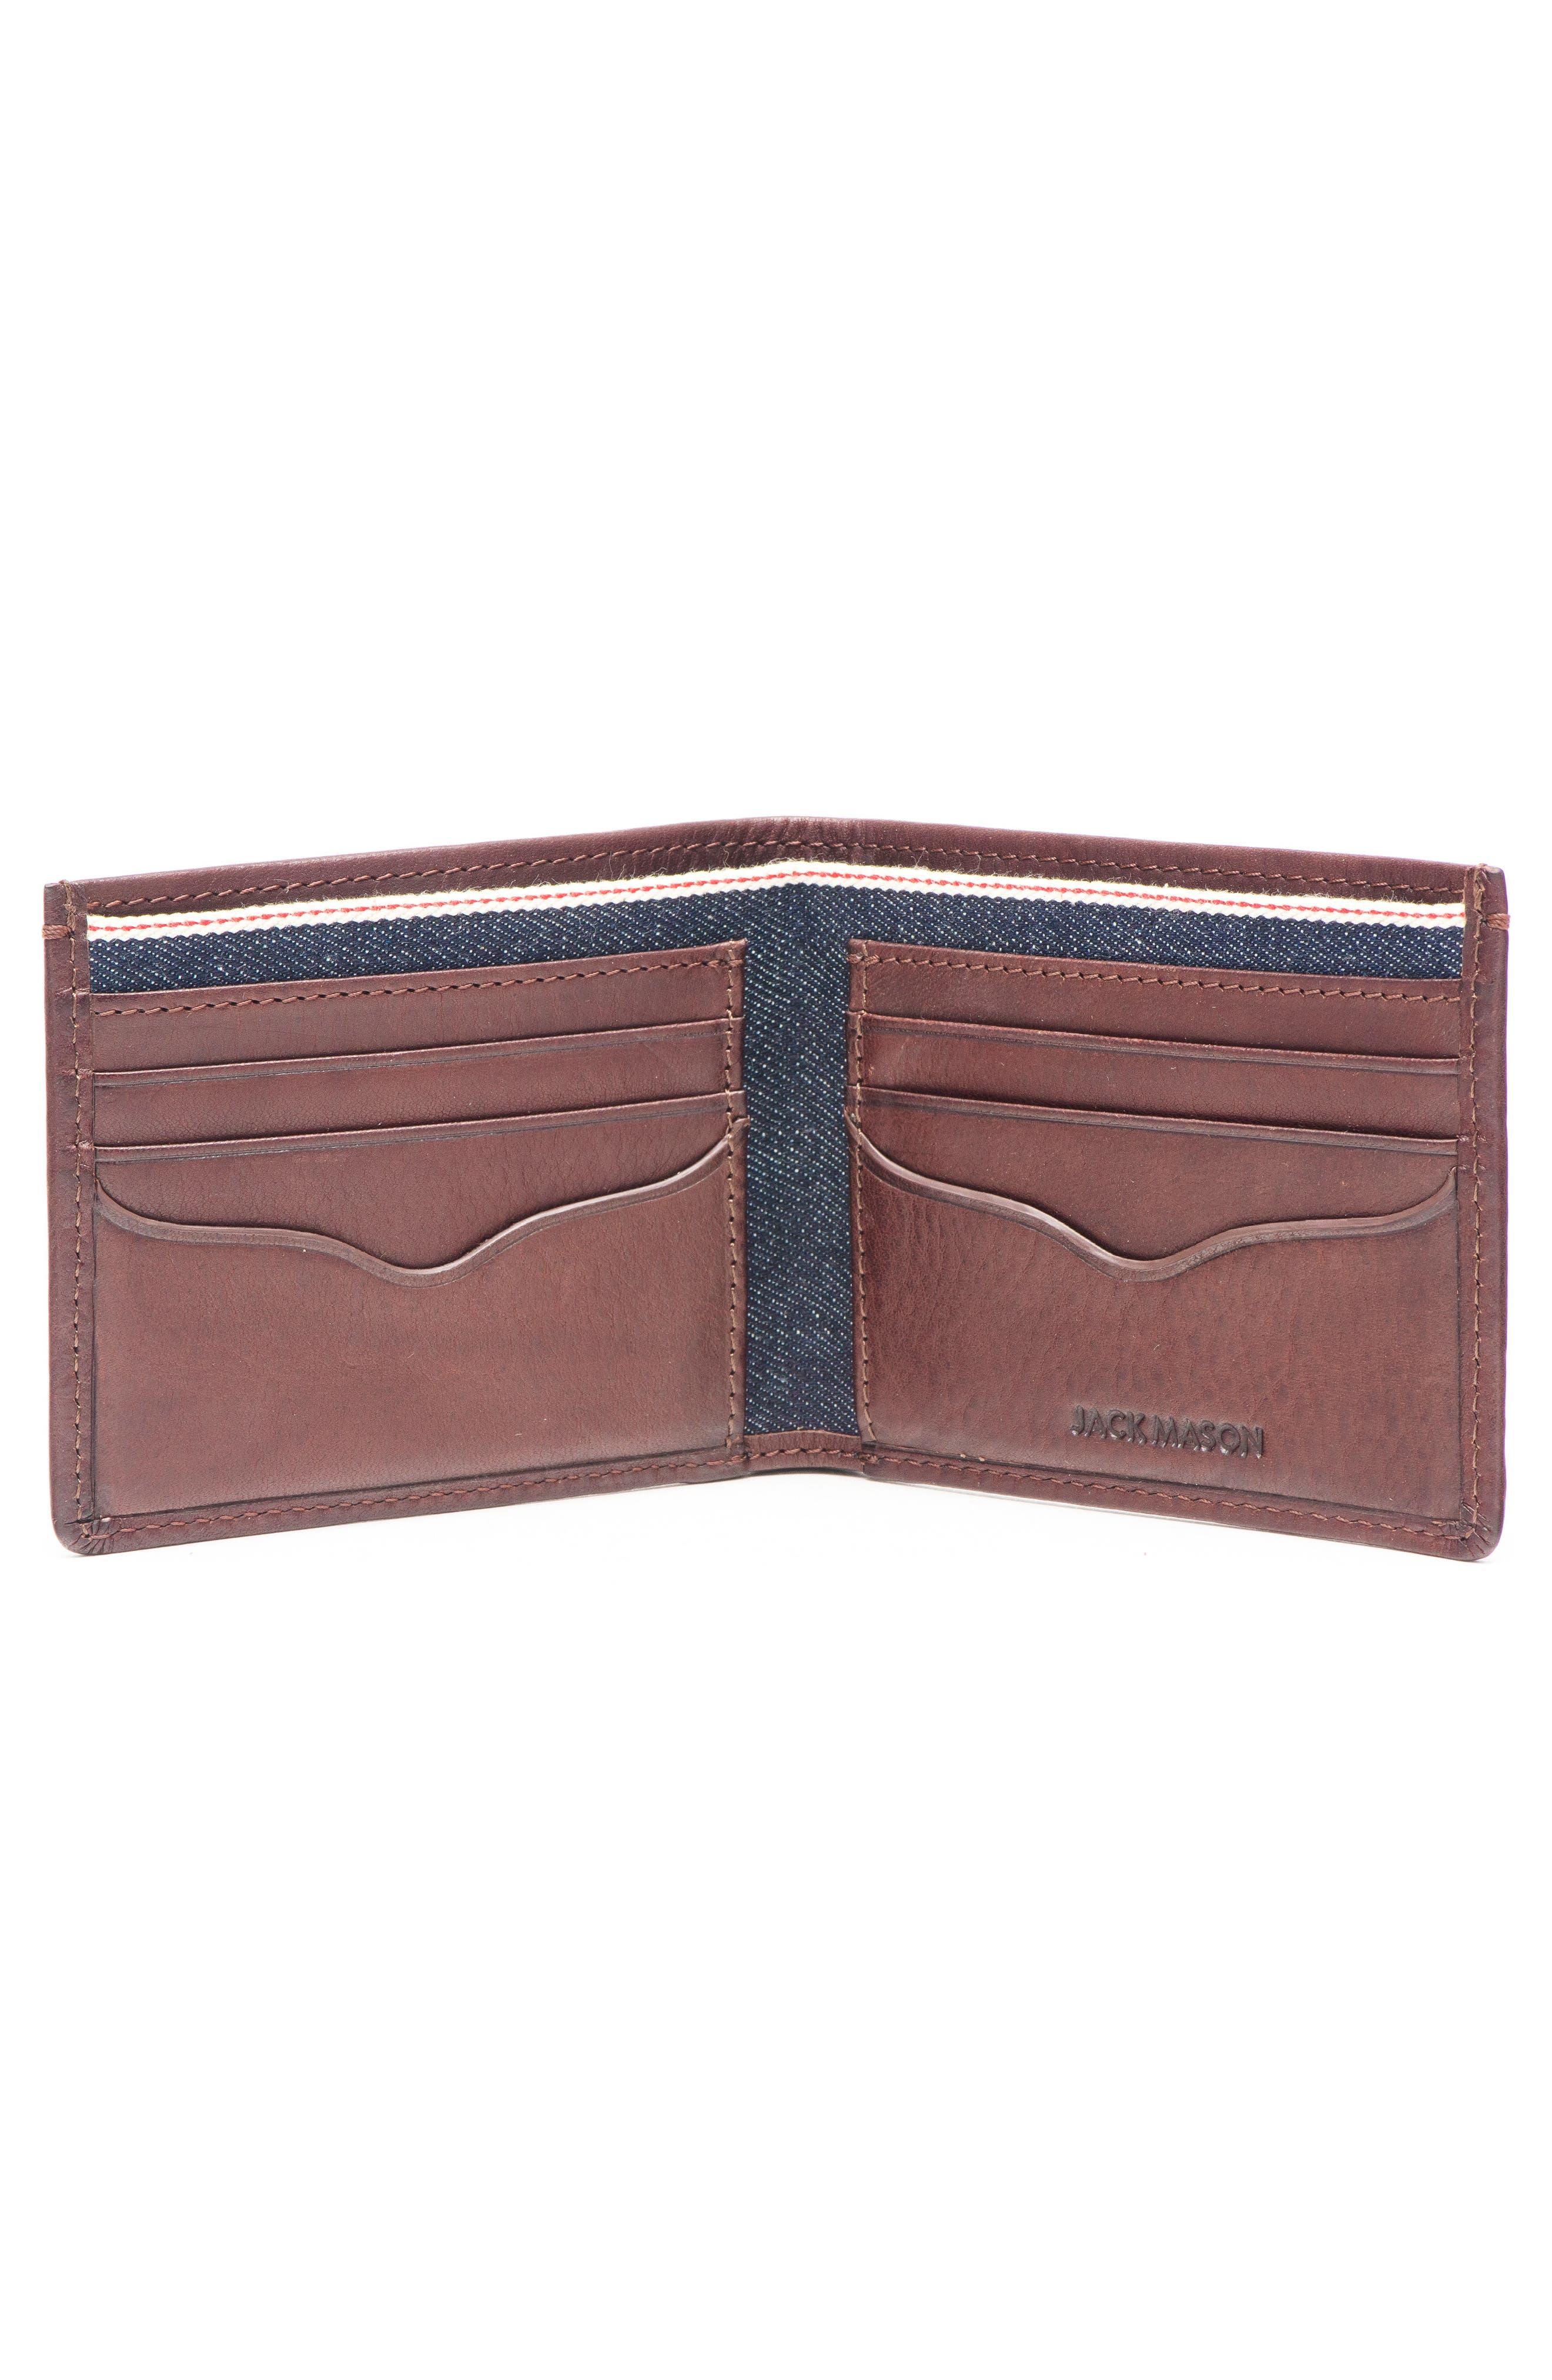 Leather & Denim Bifold Wallet,                             Alternate thumbnail 2, color,